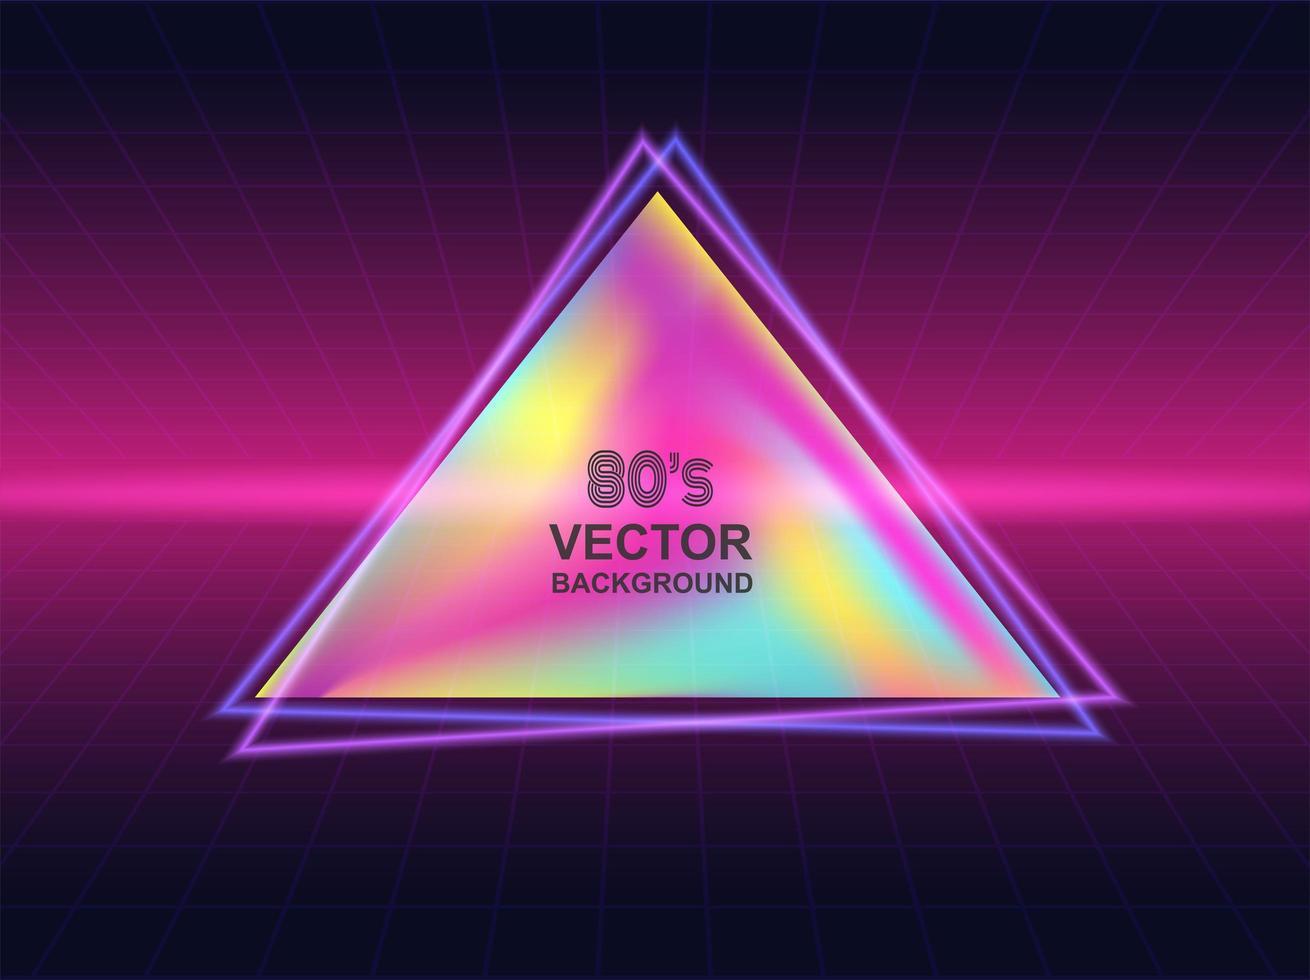 1980-talets neon triangel design vektor